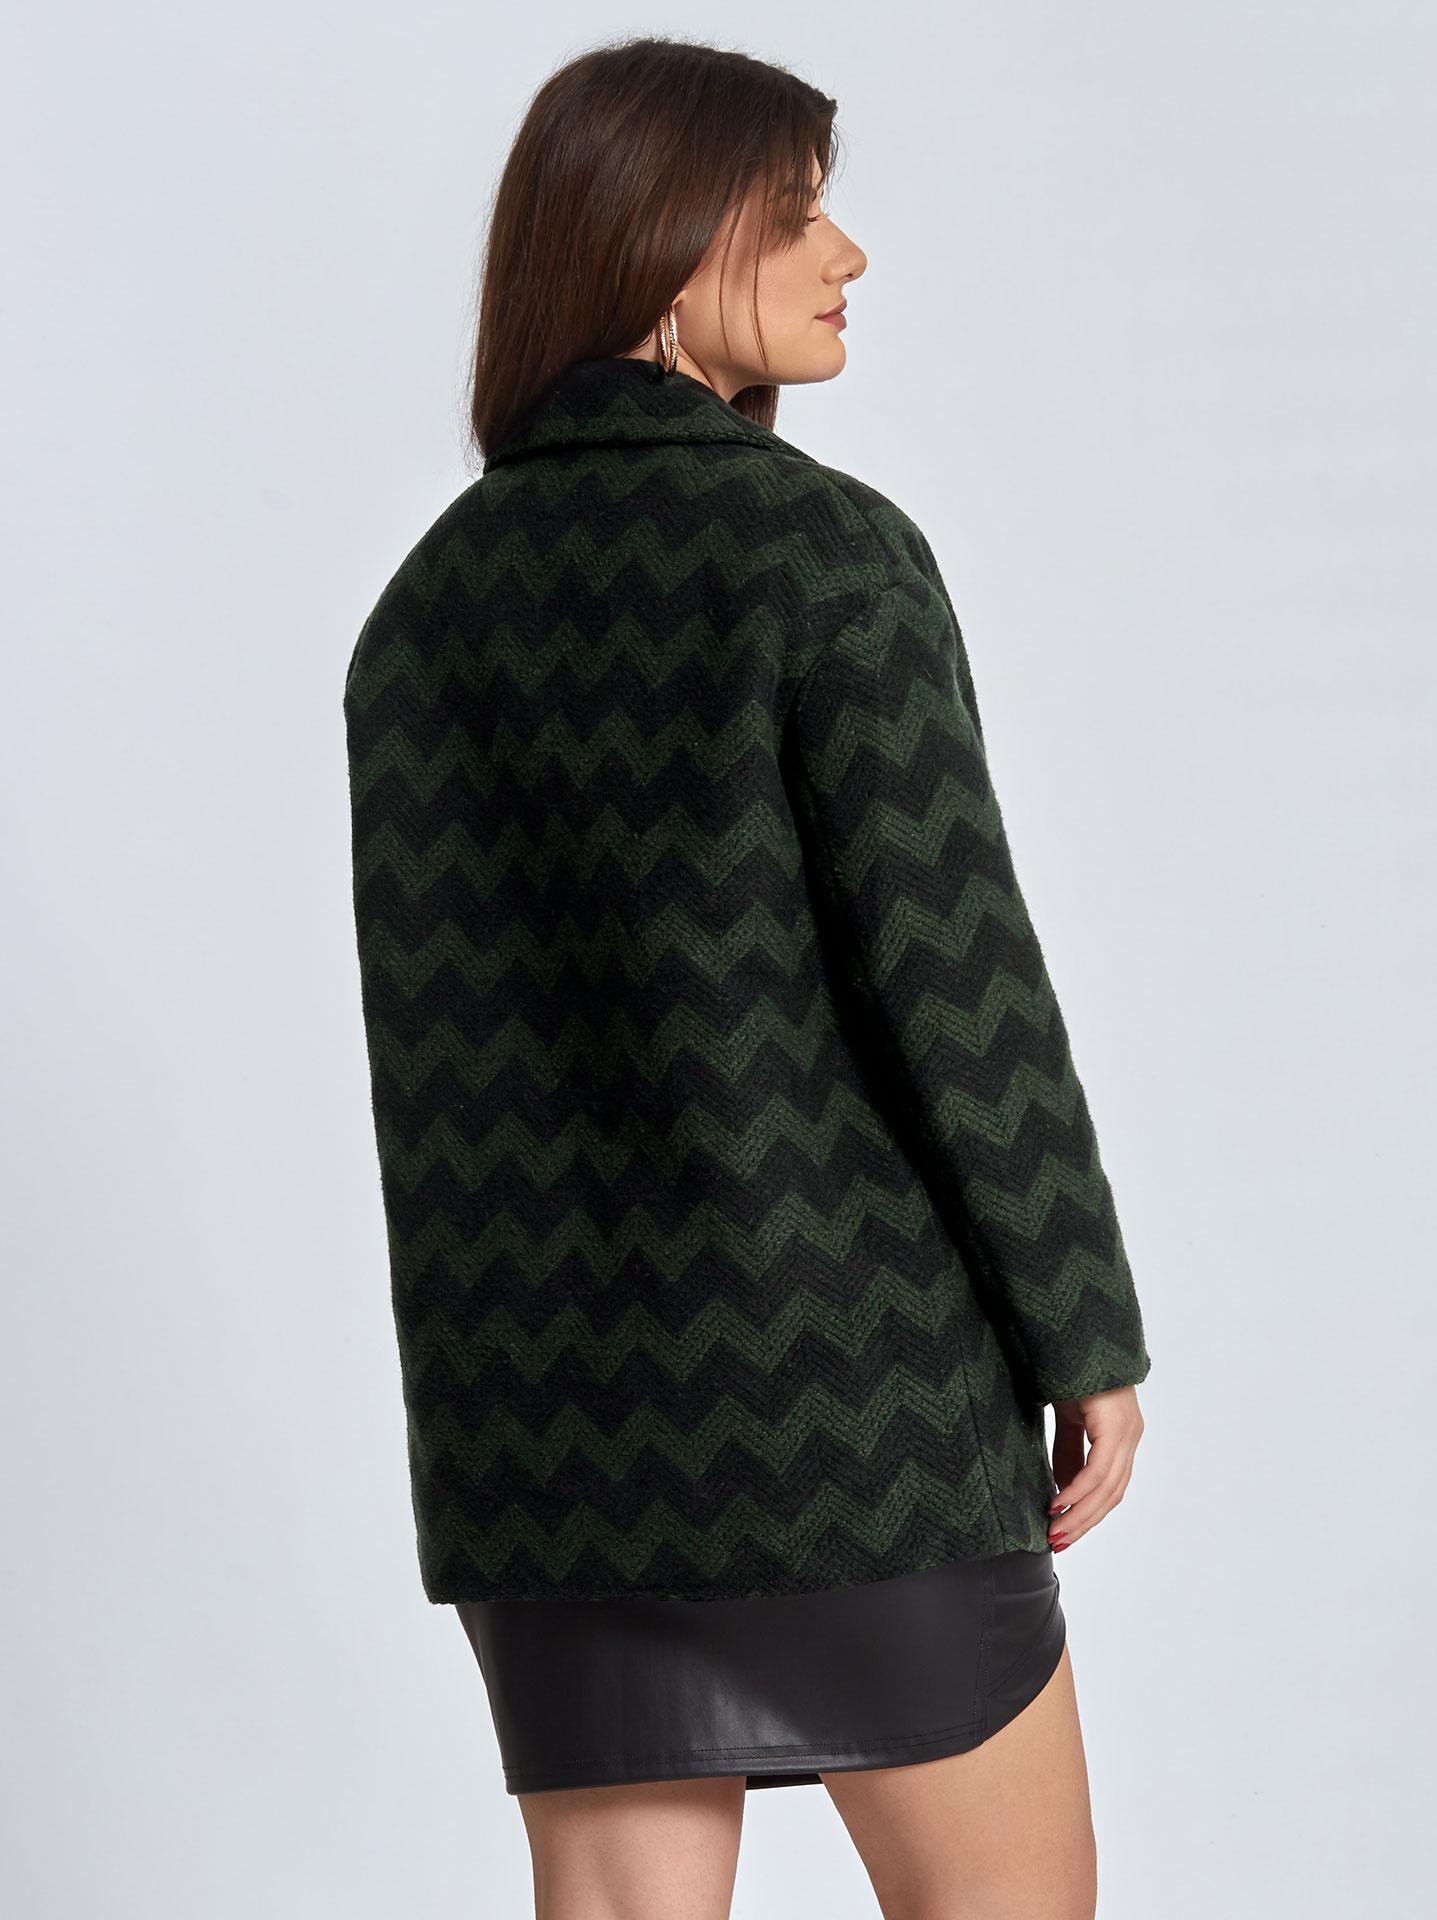 39e563a68e95 Oversized παλτό με ζικ ζακ σχέδιο curvy σε πρασινο σκουρο